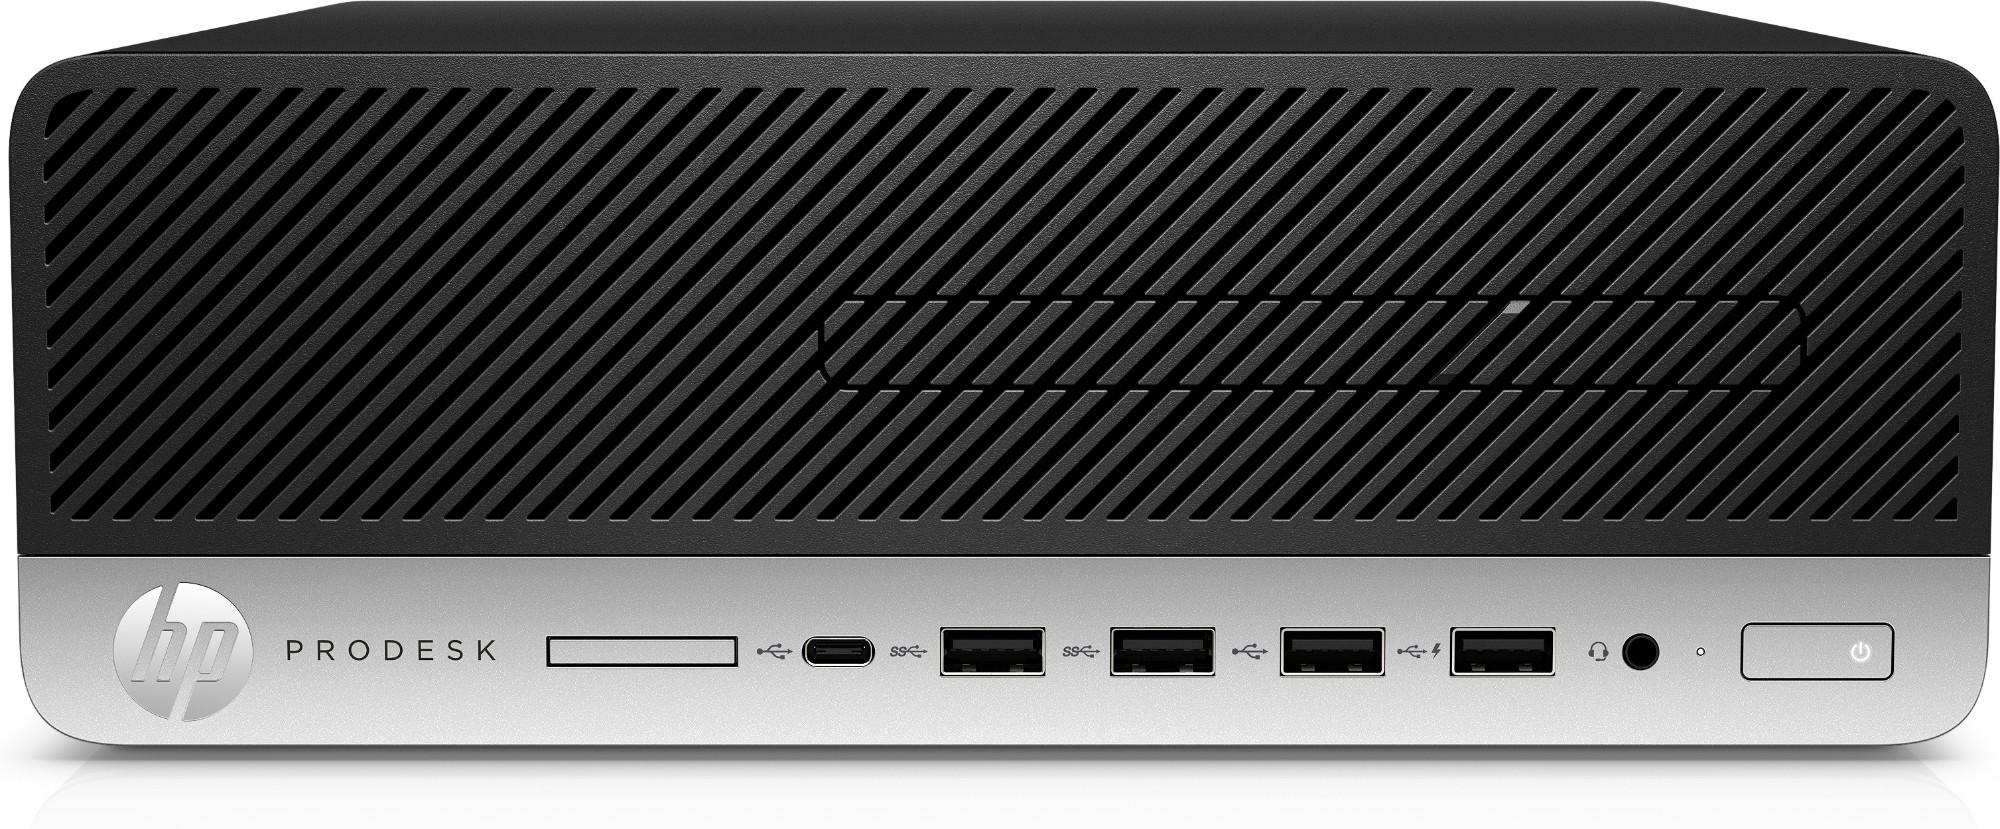 HP ProDesk 405 G4 AMD Ryzen 5 PRO 2400G 8 GB DDR4-SDRAM 256 GB SSD SFF Black PC Windows 10 Pro